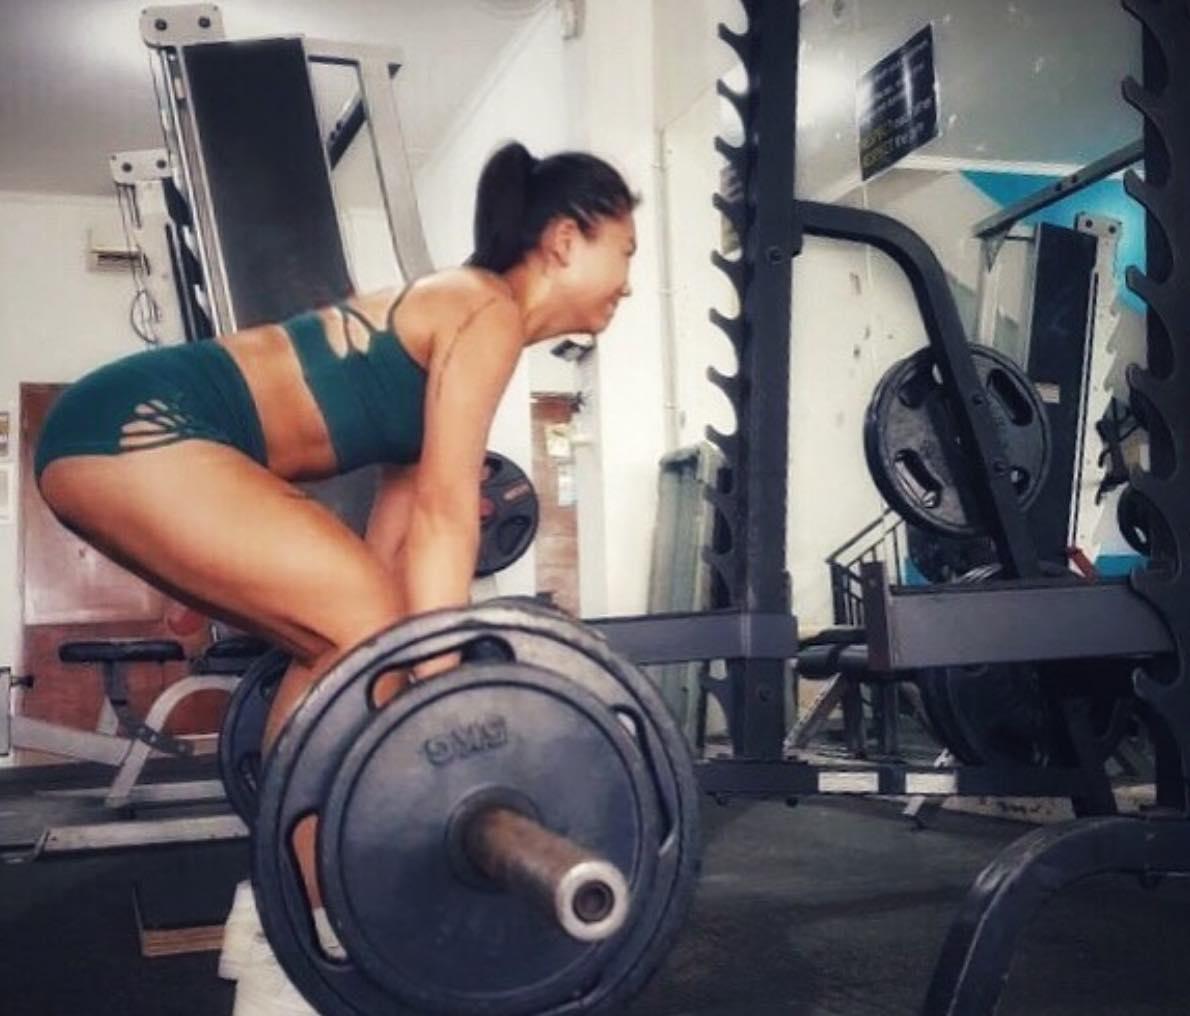 bali fitness seminyak - bali gyms